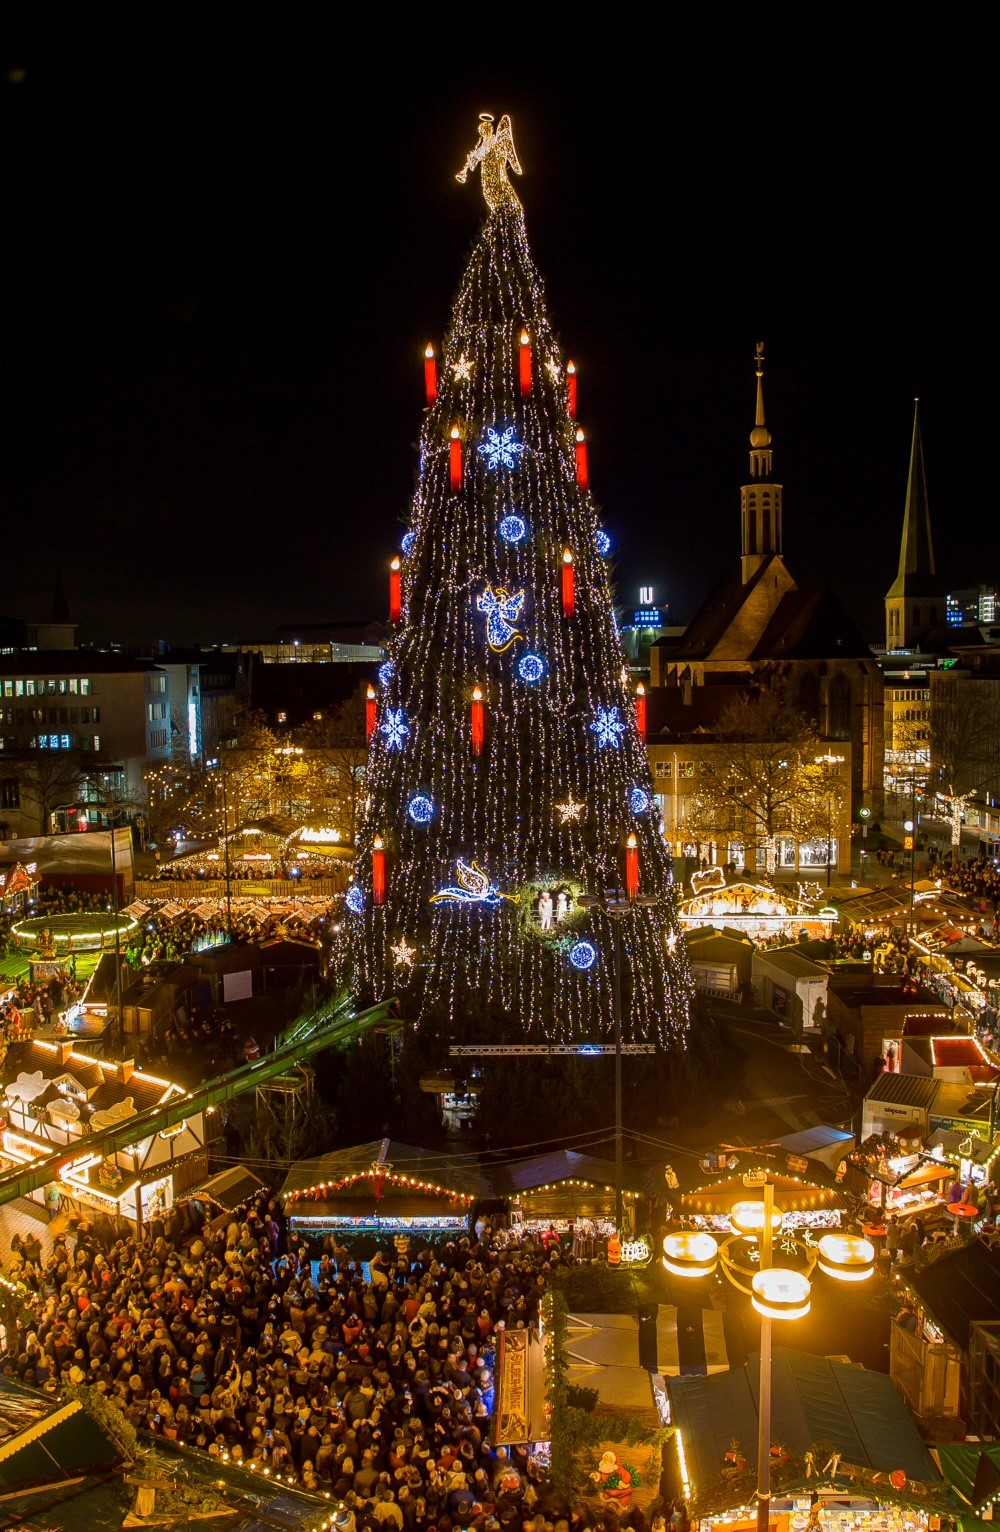 Kocher kümmert sich um Beleuchtung des Dortmunder Weihnachtsbaums